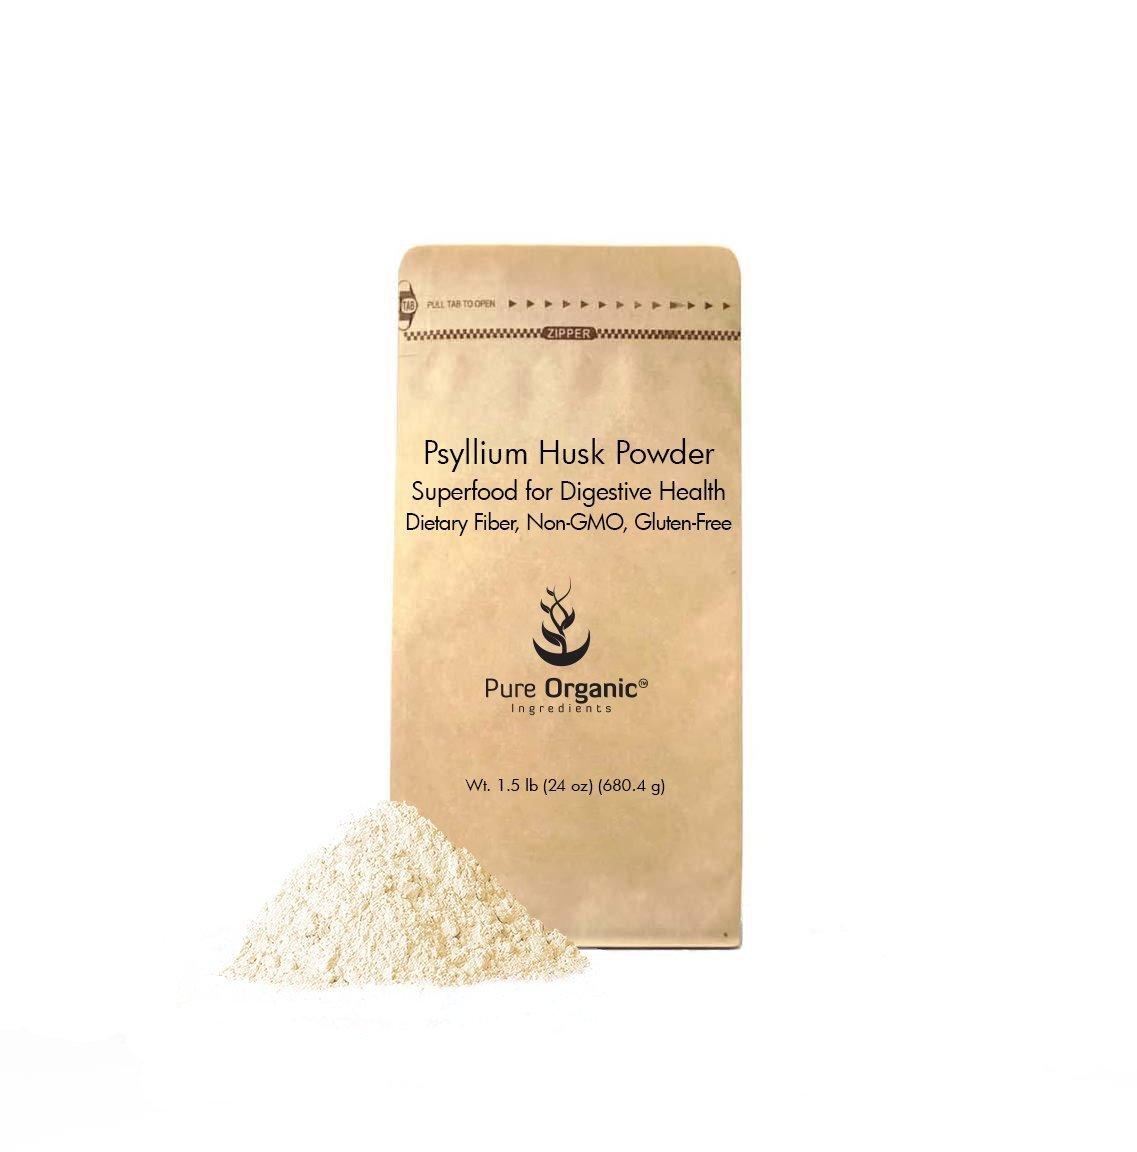 Psyllium Husk Powder by Pure Organic Ingredients, 1.5 lb, Fiber Powder Supplement, Additive for Gluten-Free Baking